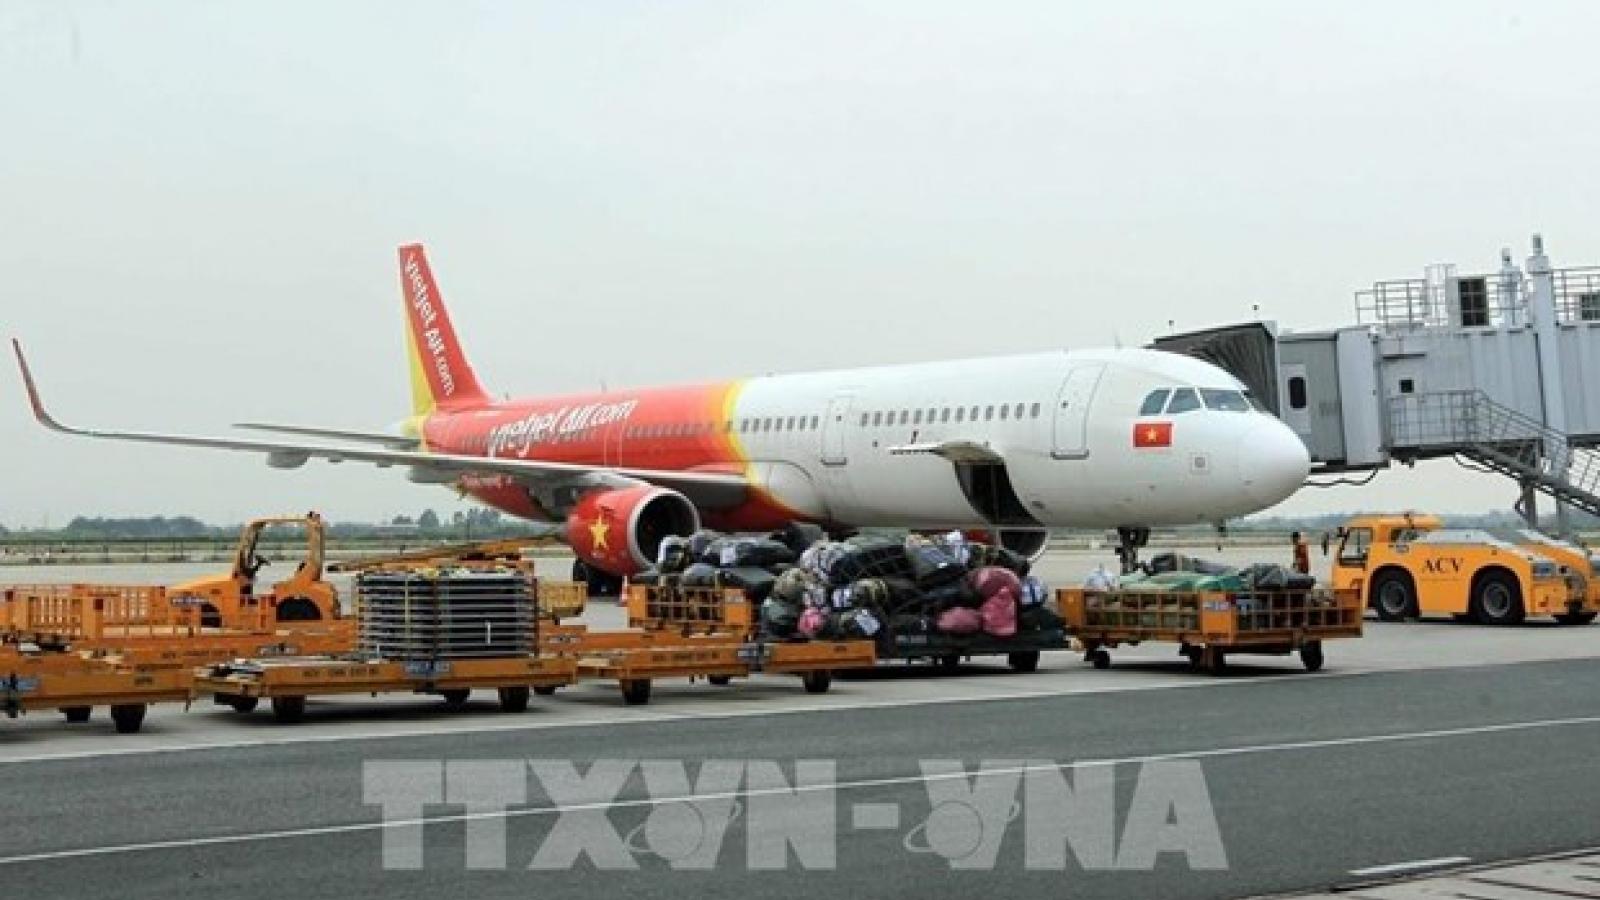 Flights between Hai Phong and HCM City temporarily halted